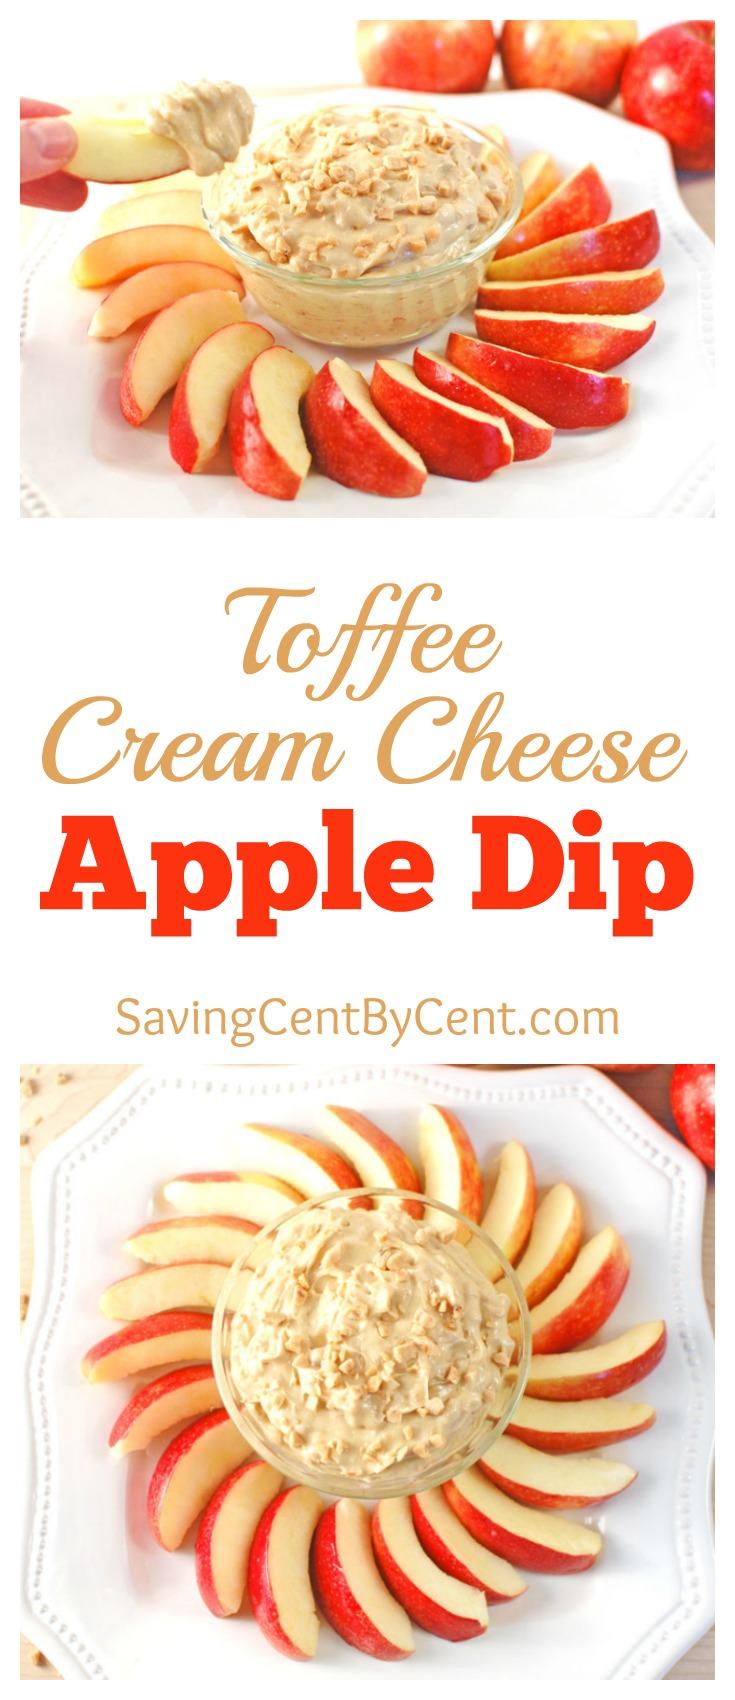 Toffee Cream Cheese Apple Dip